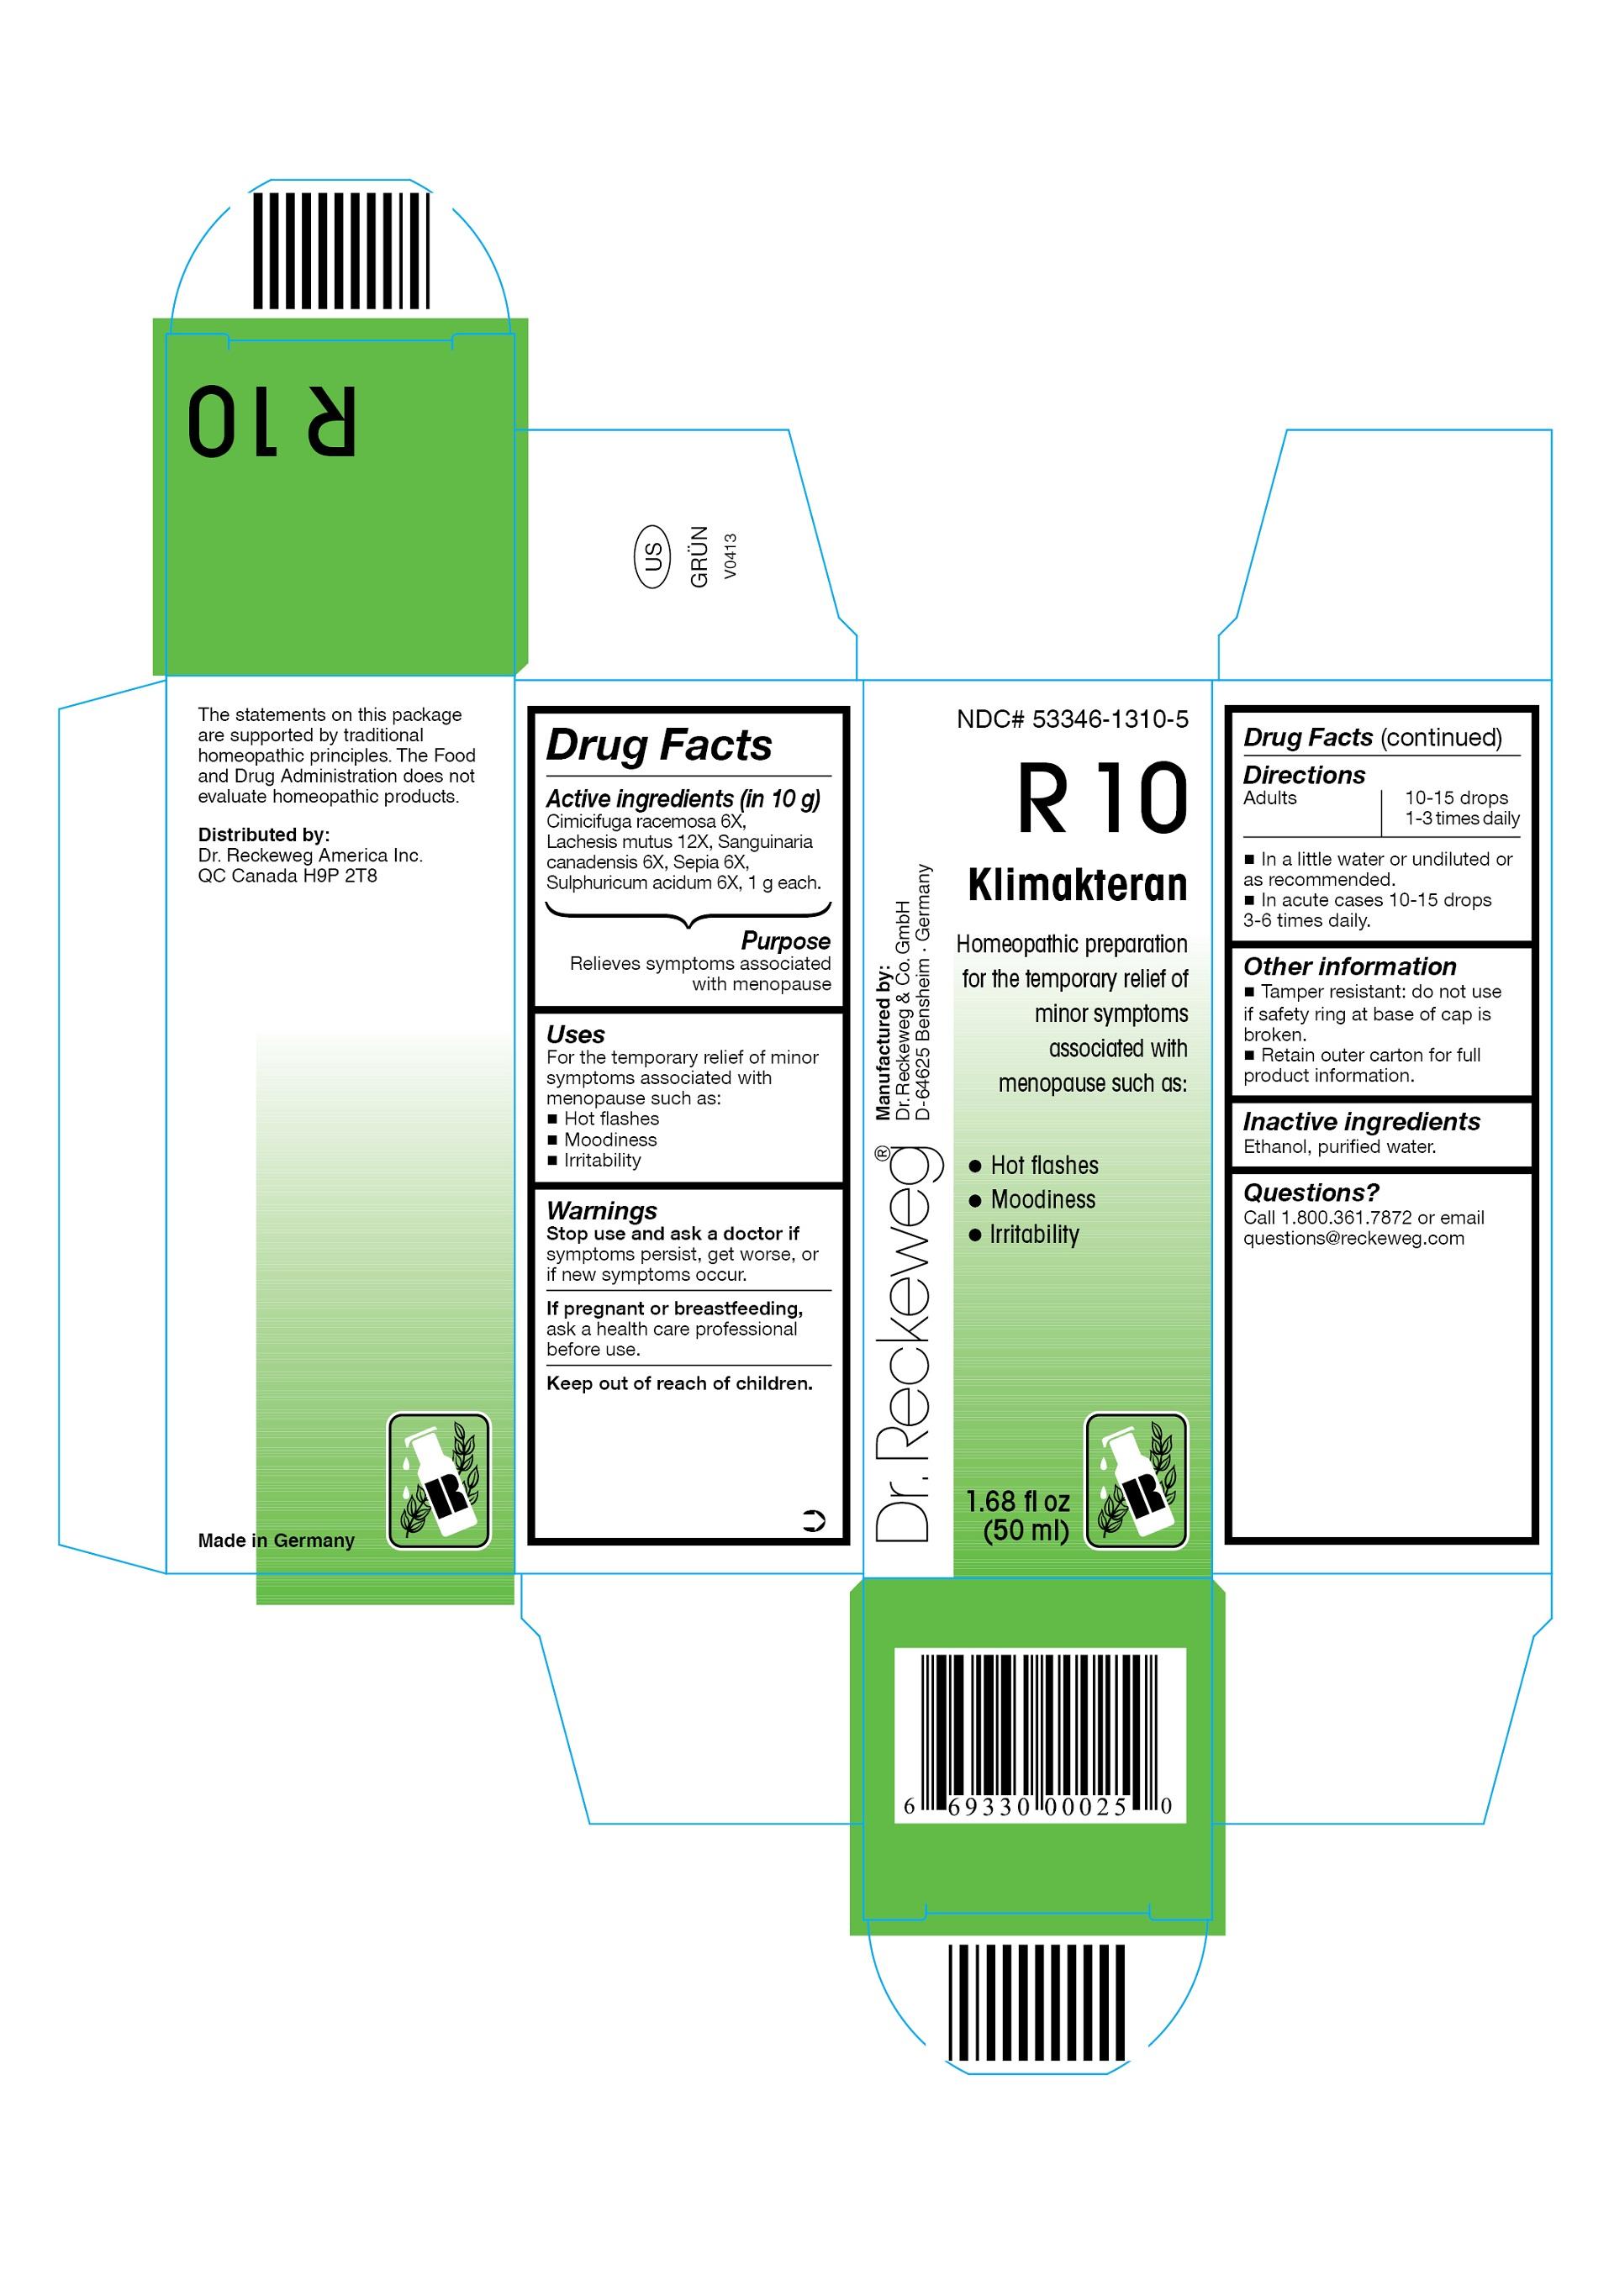 Dr. Reckeweg R10 Klimakteran Combination Product (Cimicifuga Racemosa 6x, Lachesis Mutus 12x, Sanguinaria Canadensis 6x, Sepia 6x, Sulfuricum Acidum 6x) Liquid [Pharmazeutische Fabrik Dr. Reckeweg & Co]